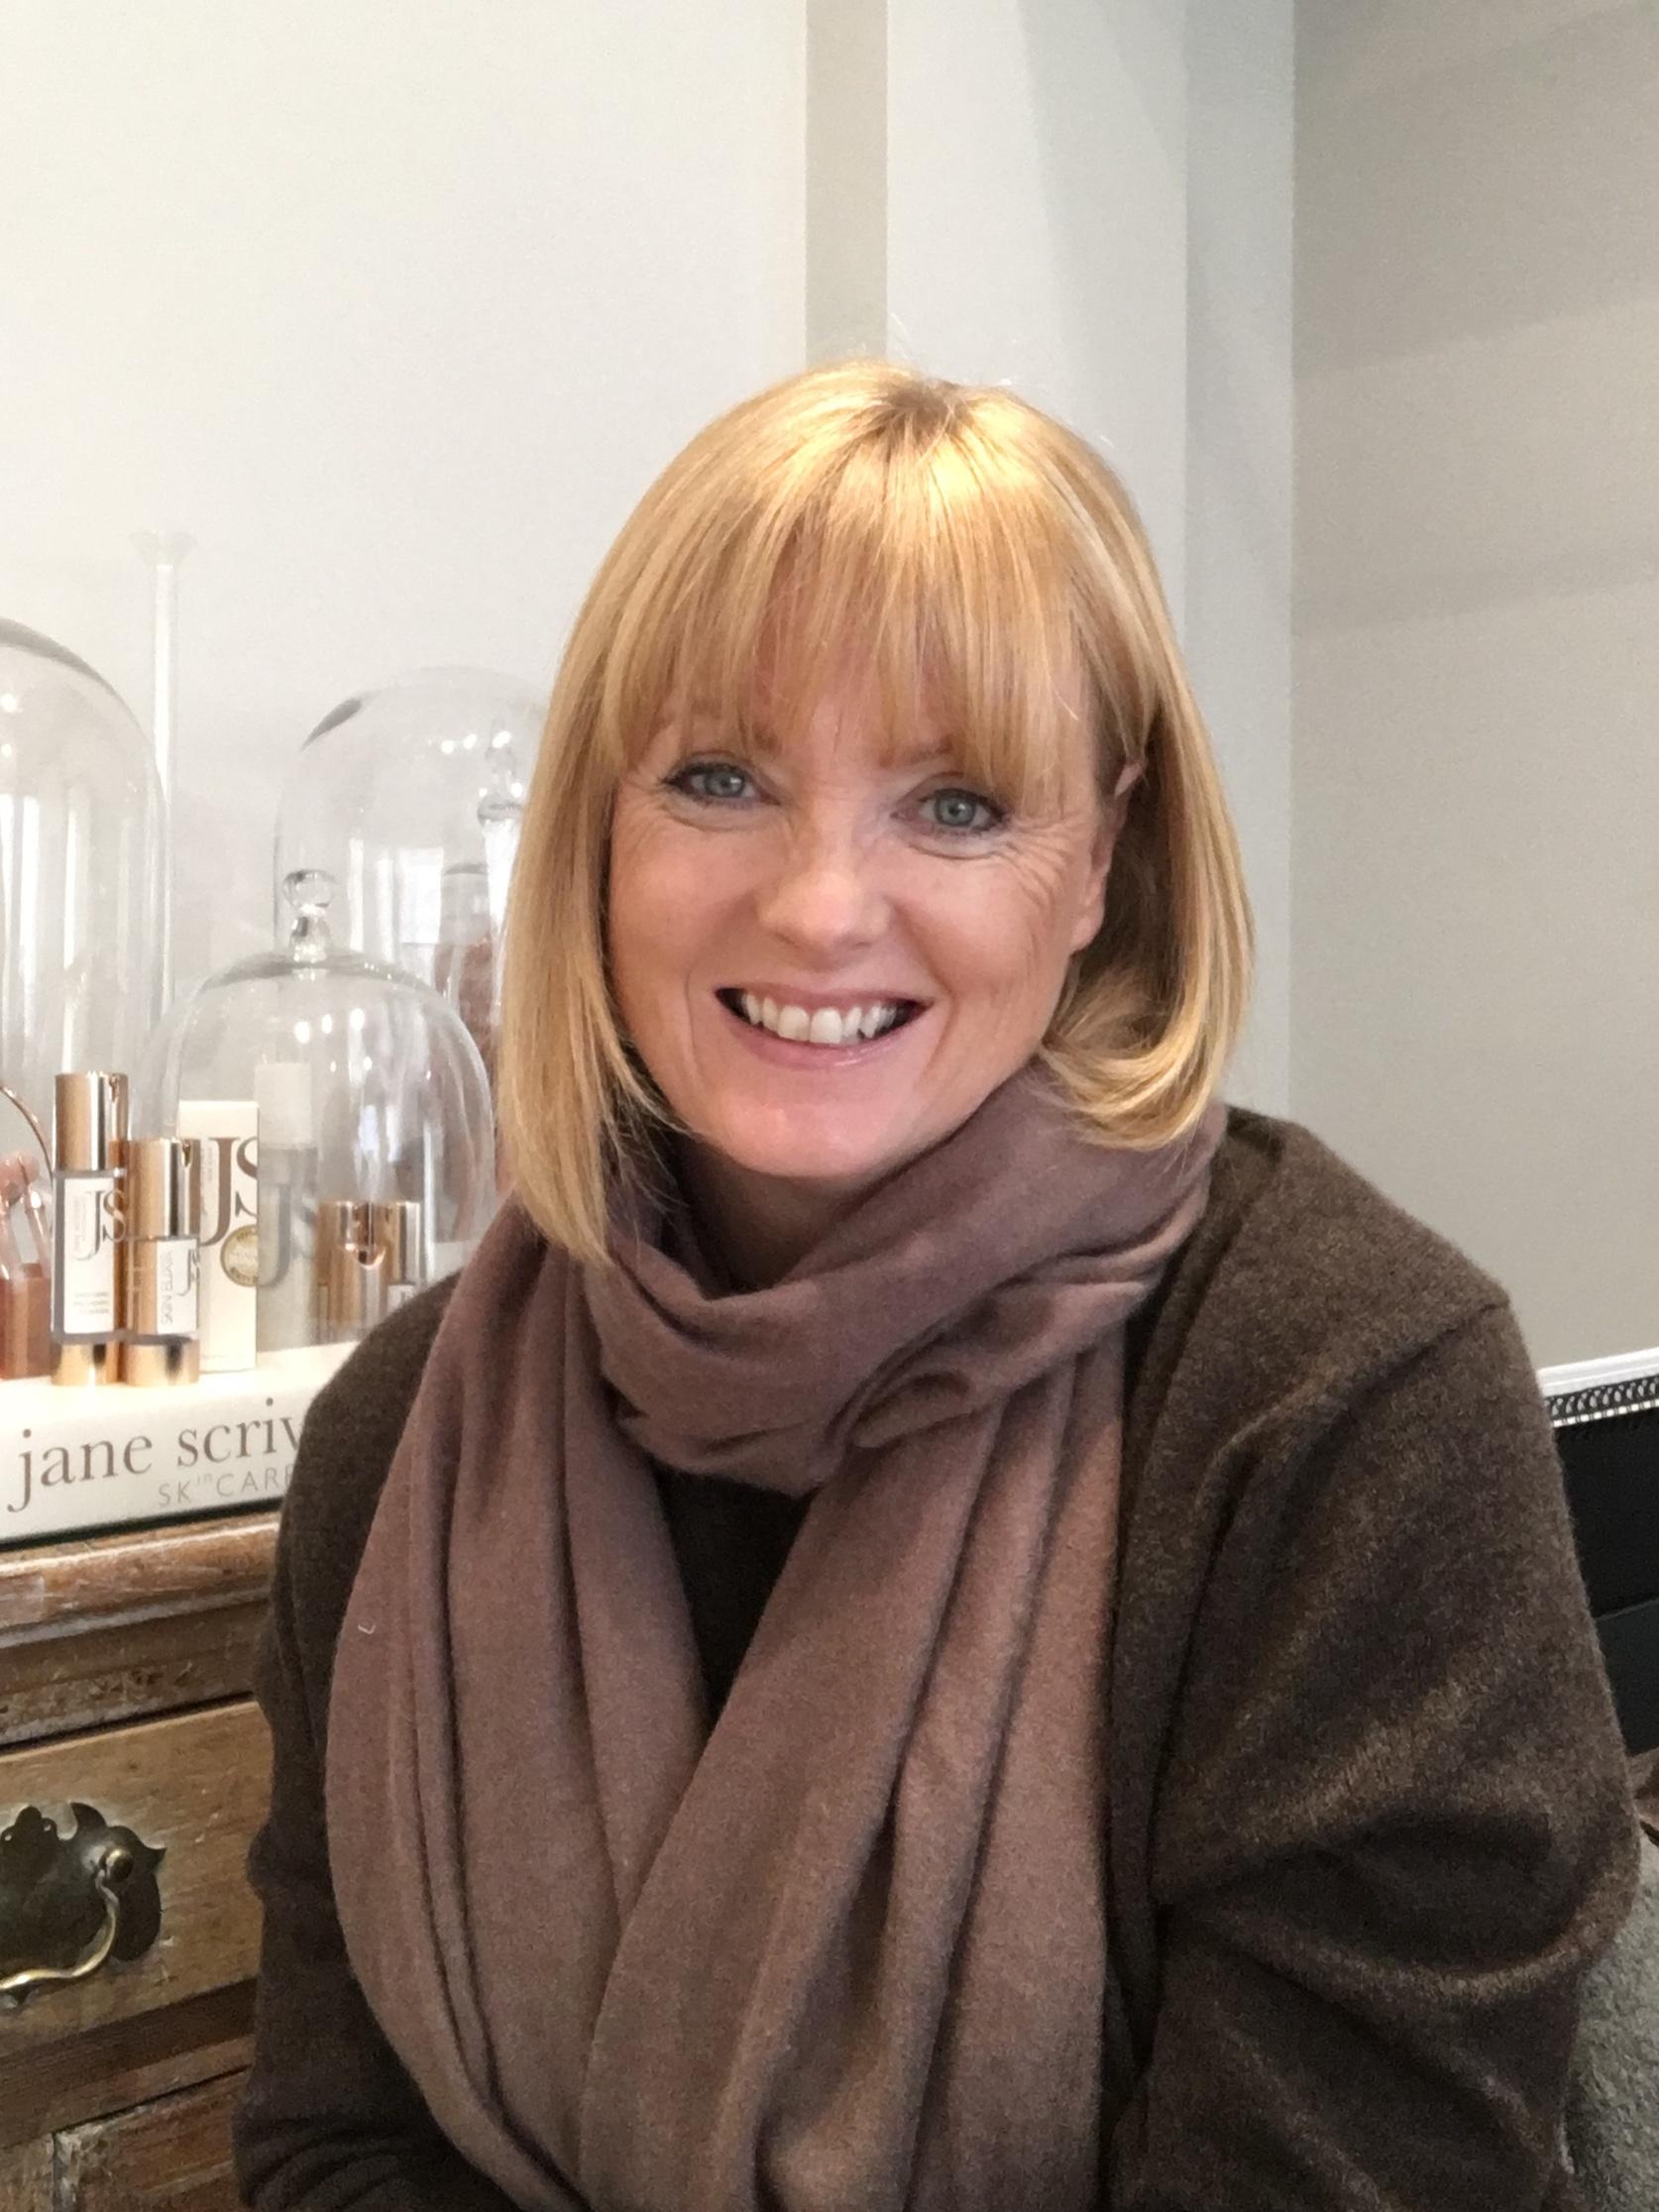 Q&A with Jane Scrivner